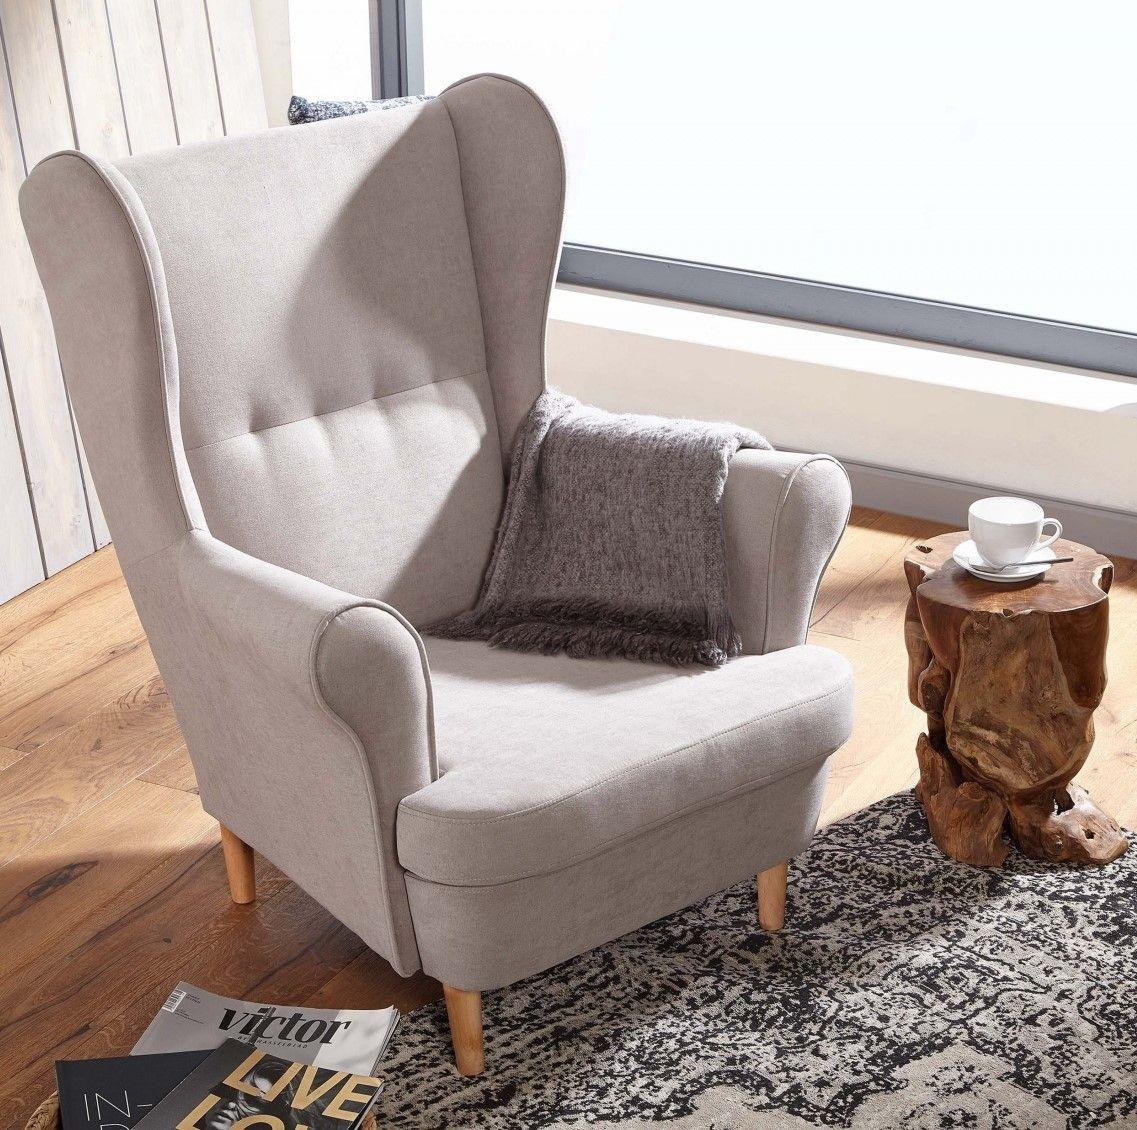 Wohnzimmer Sitzsack Chacos In Weiß Taupe: Sessel 86x83x91 Taupe SCANDI #110 In 2019